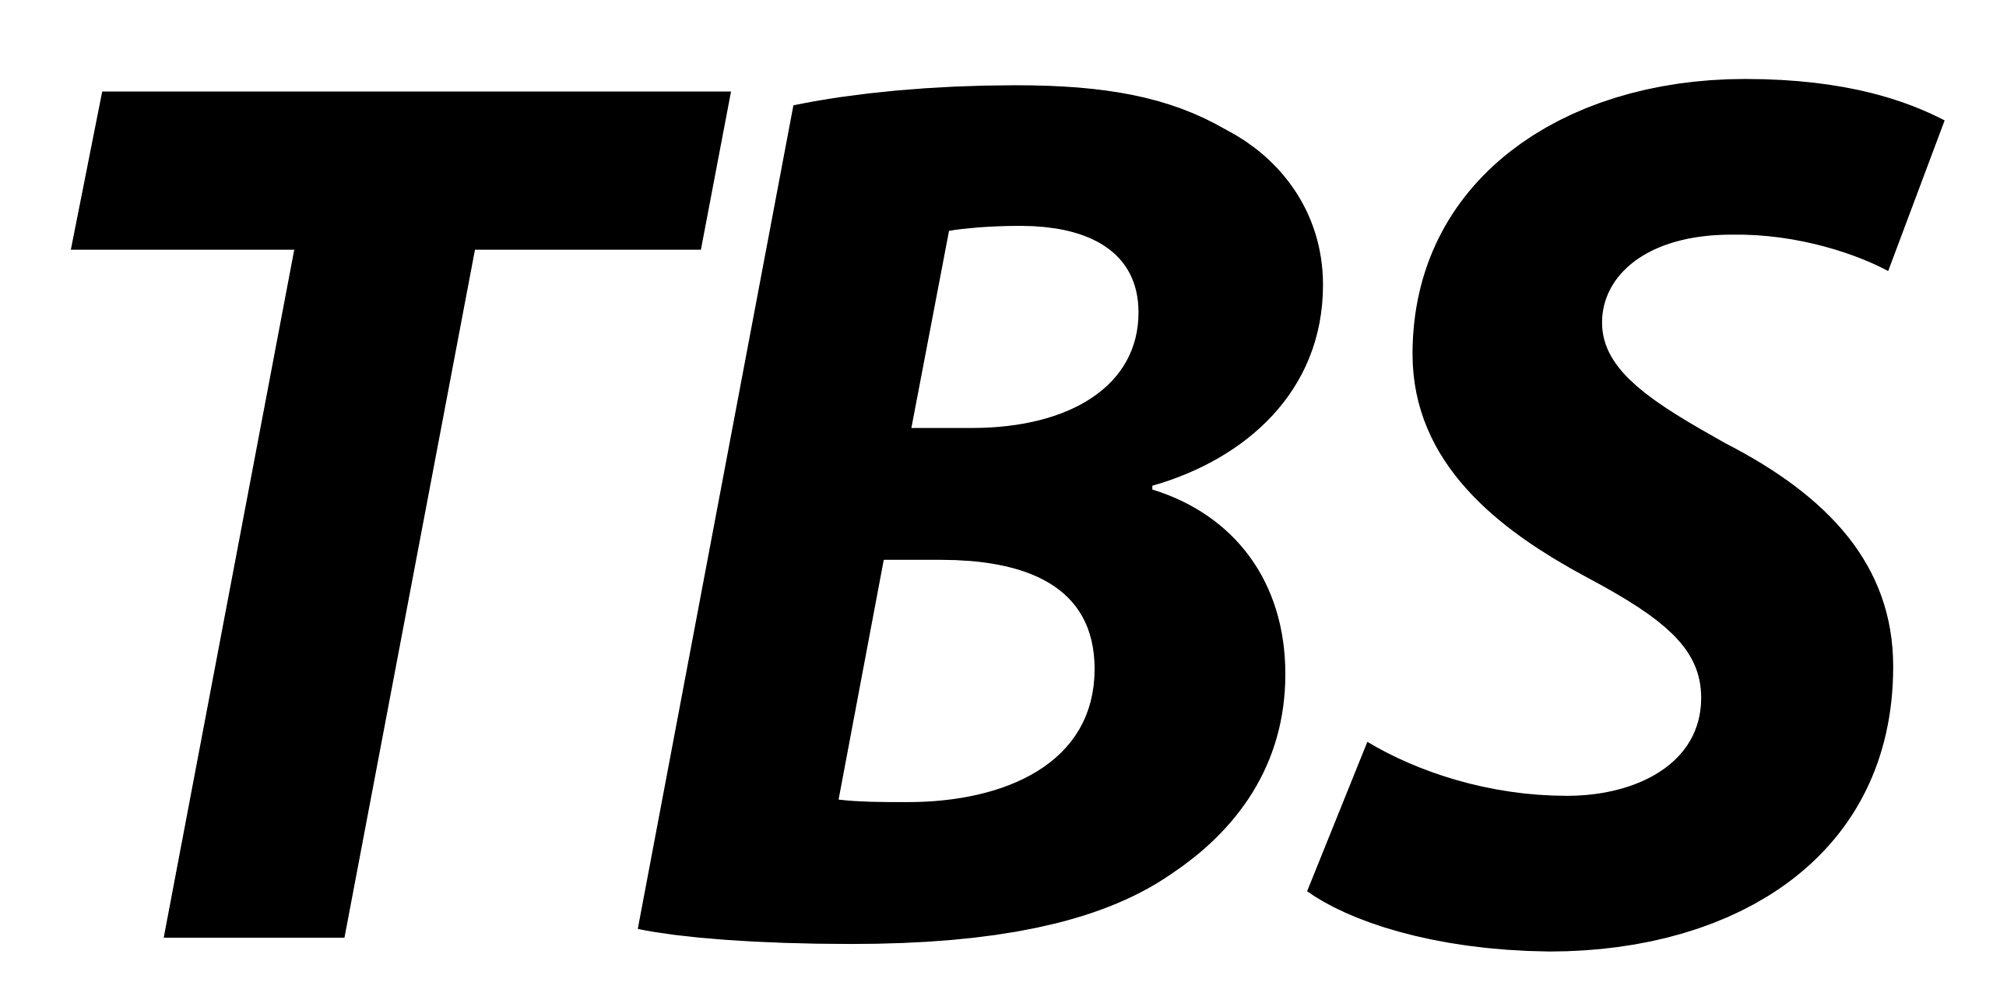 Tbs Logopedia Fandom Powered By Wikia